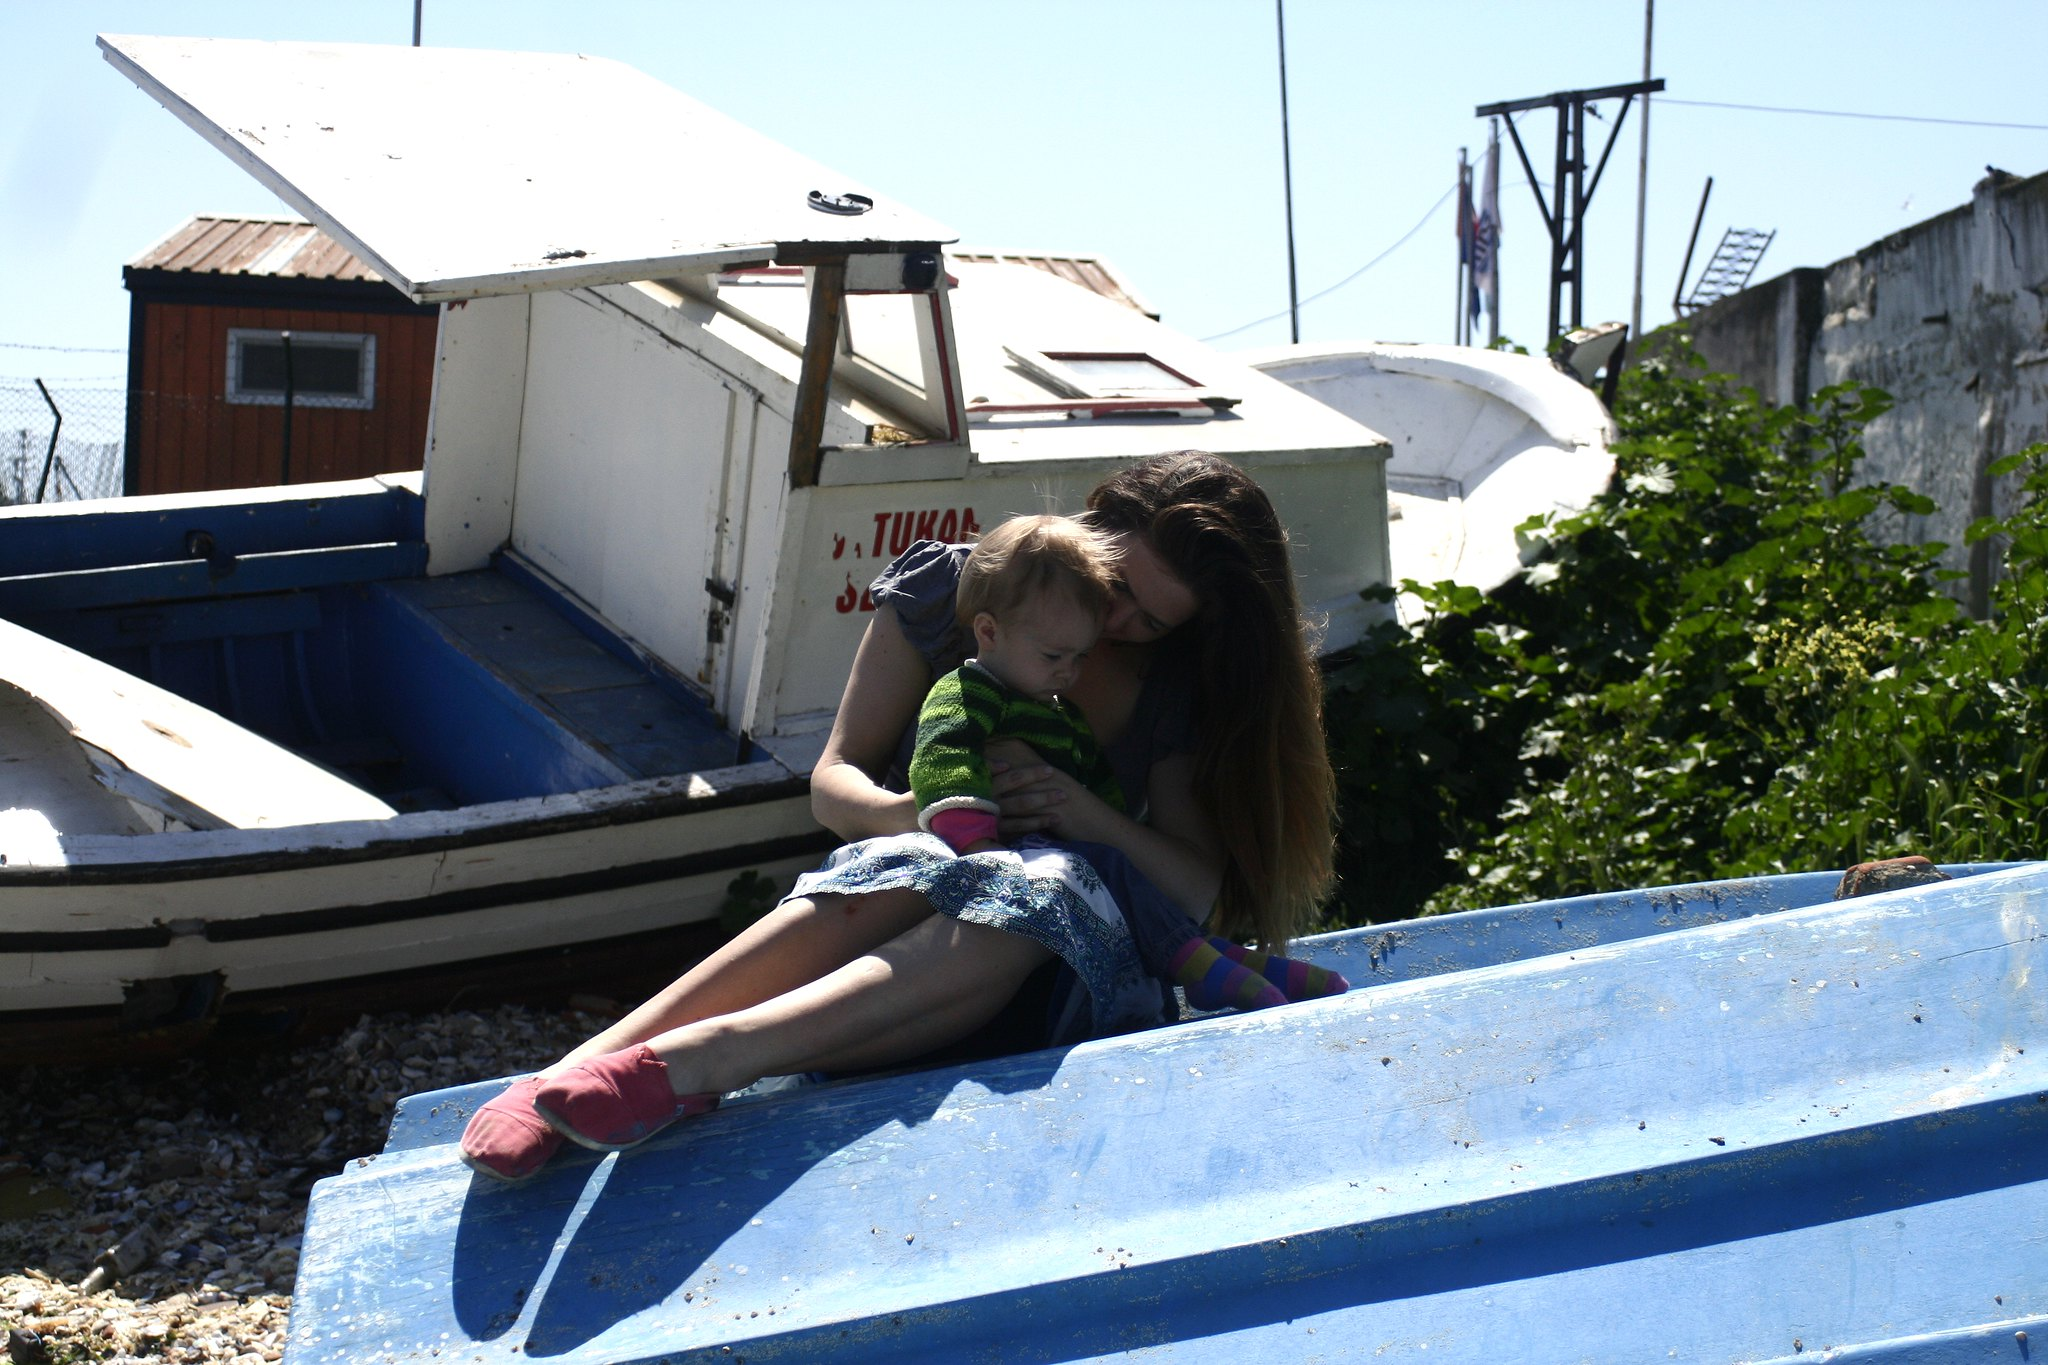 Me and Neve at the Heybeliada boatyard.